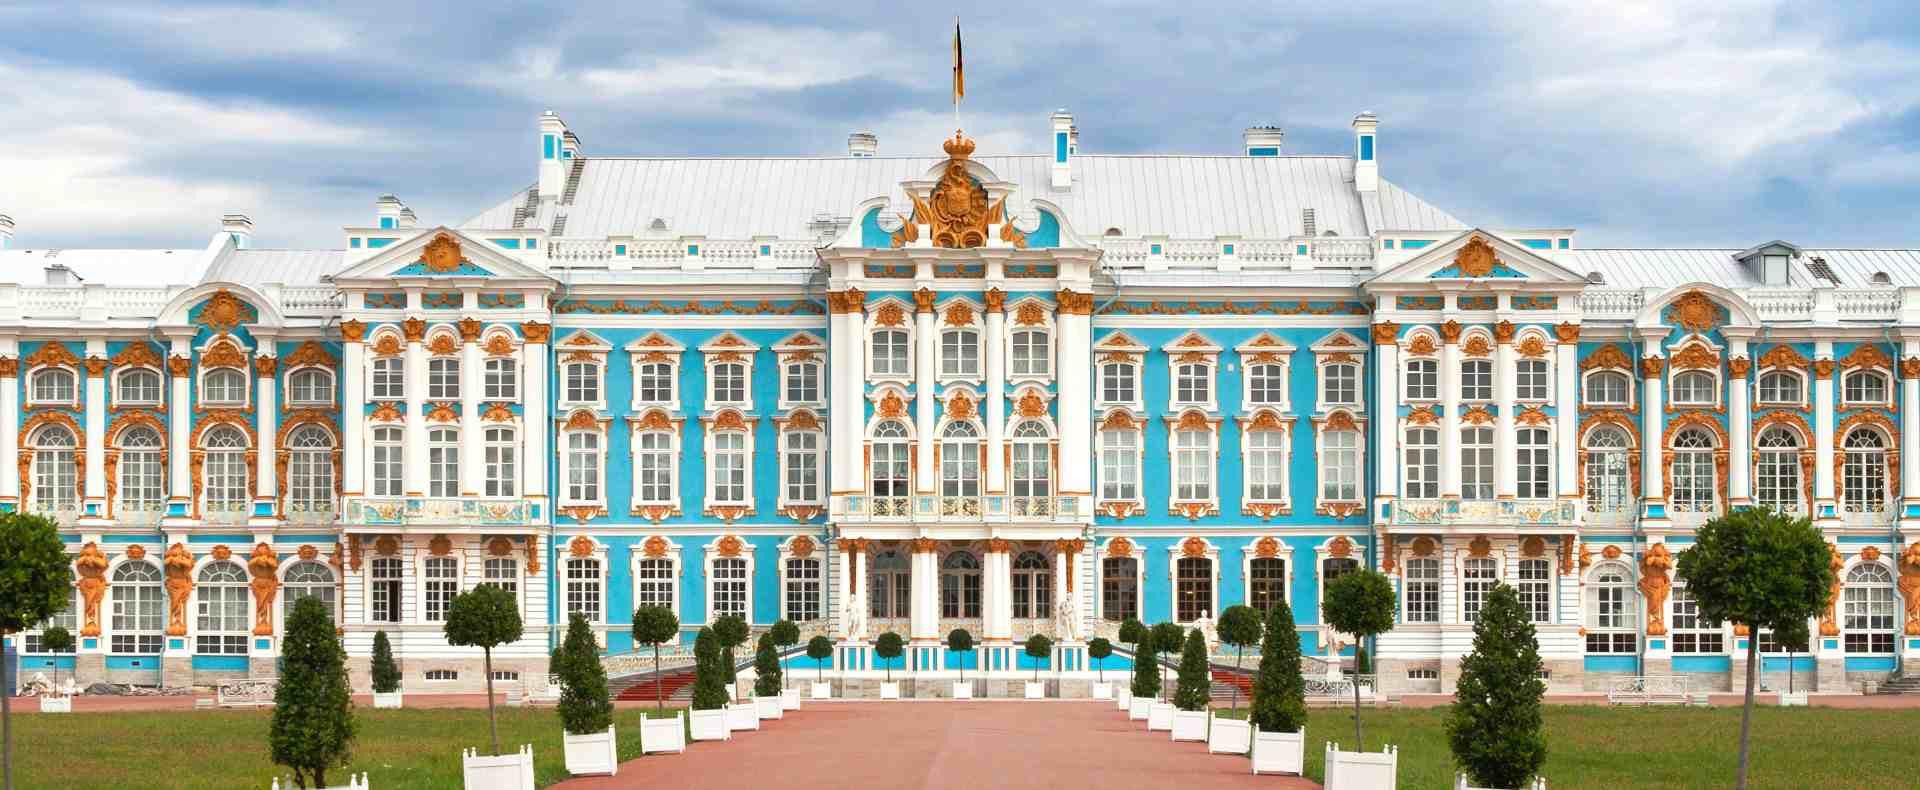 Catherine's Palace (Tsarskoye Selo), Saint Petersburg